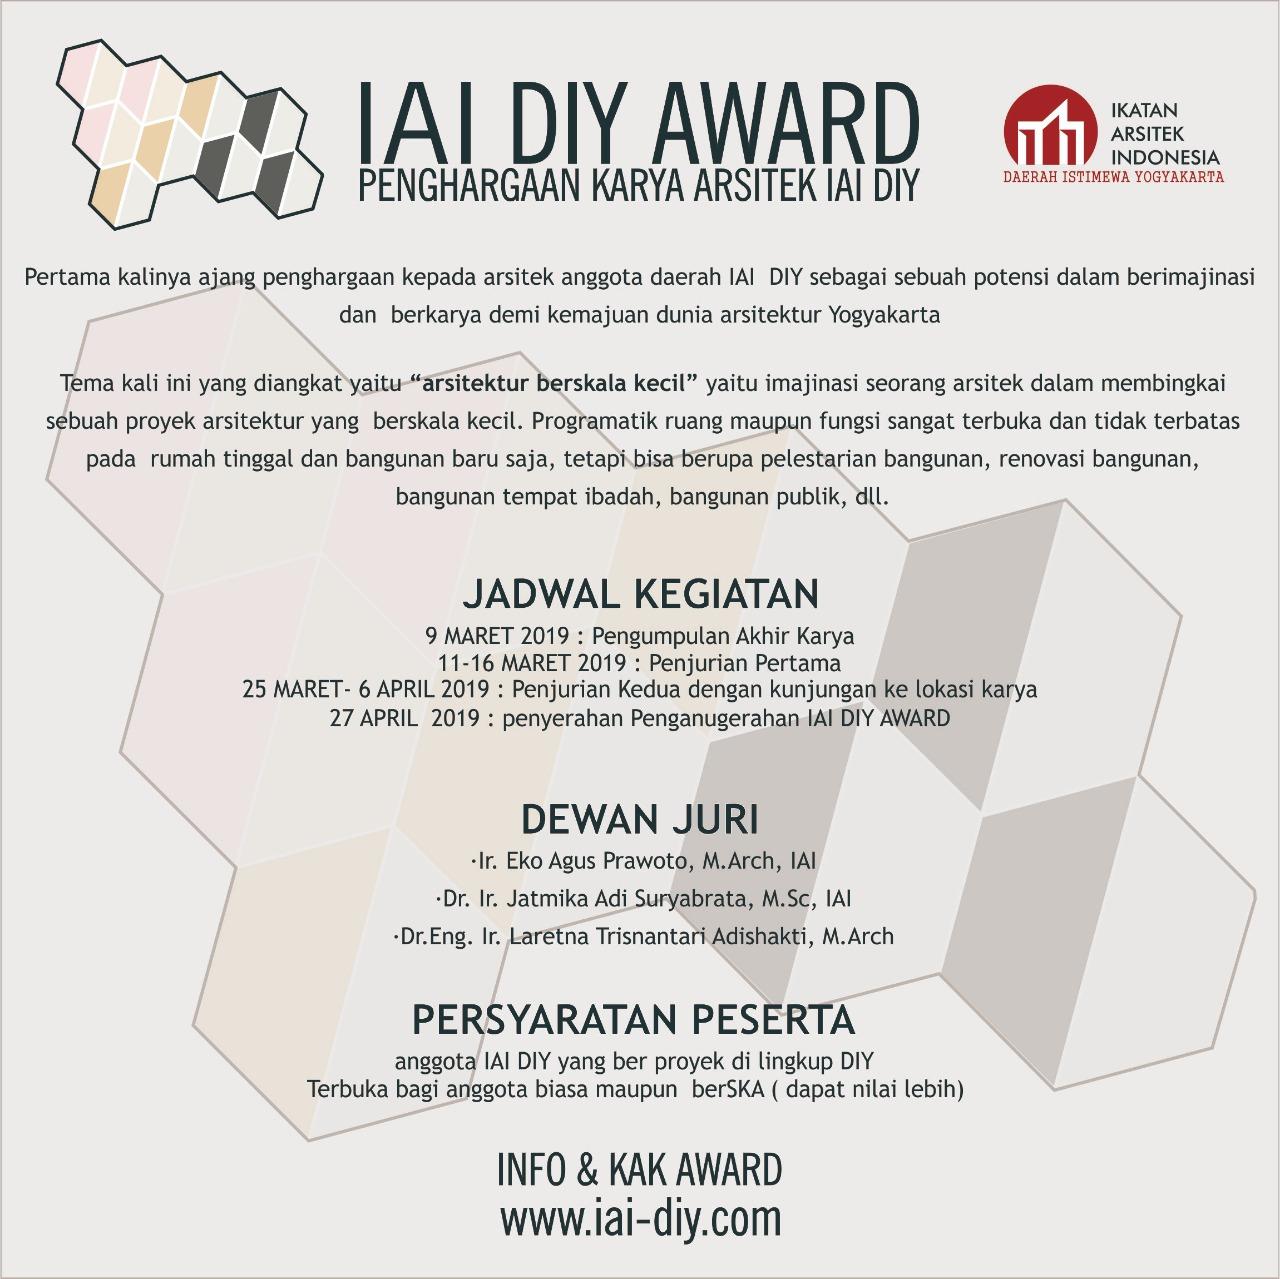 AWARD IAI DIY AWARD Penghargaan Karya Arsitek IAI DIY 2019 IAI DIY